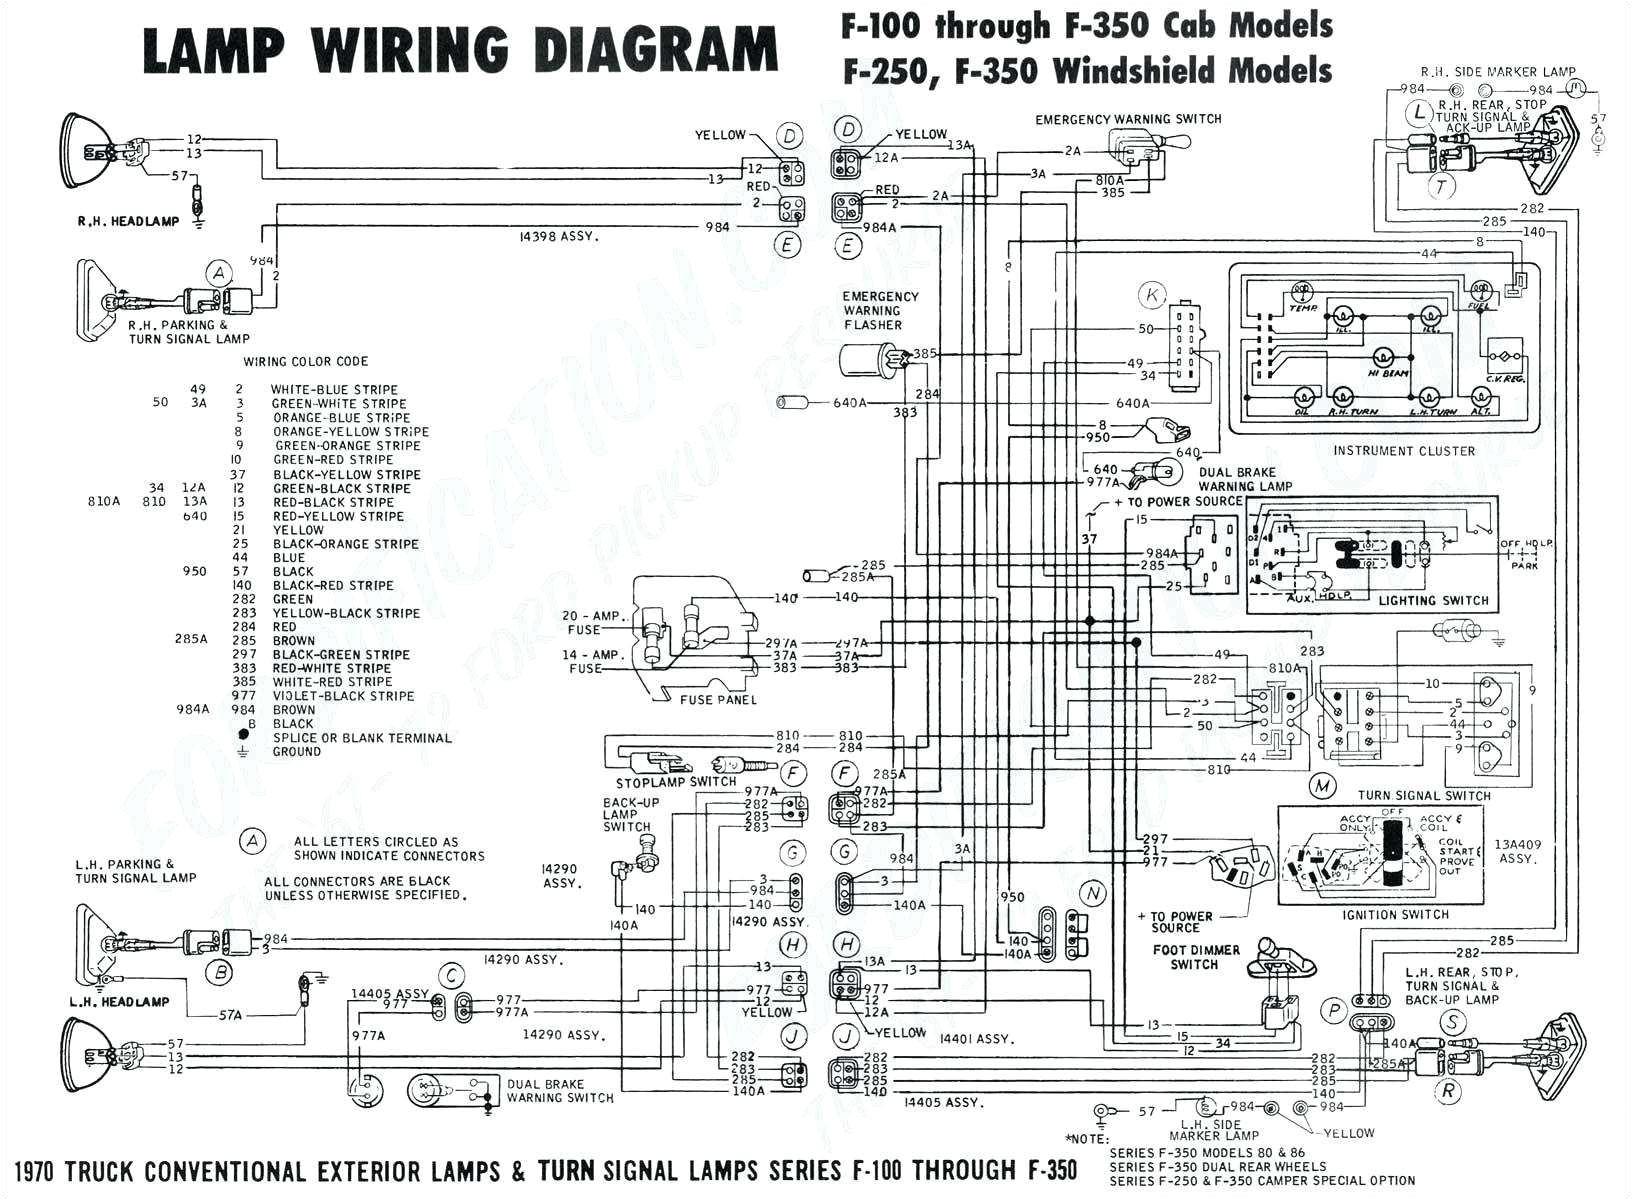 2004 dodge ram 1500 headlight wiring diagram wiring diagram article 04 dodge ram 1500 headlight wiring diagram 2004 dodge ram 1500 headlight wiring